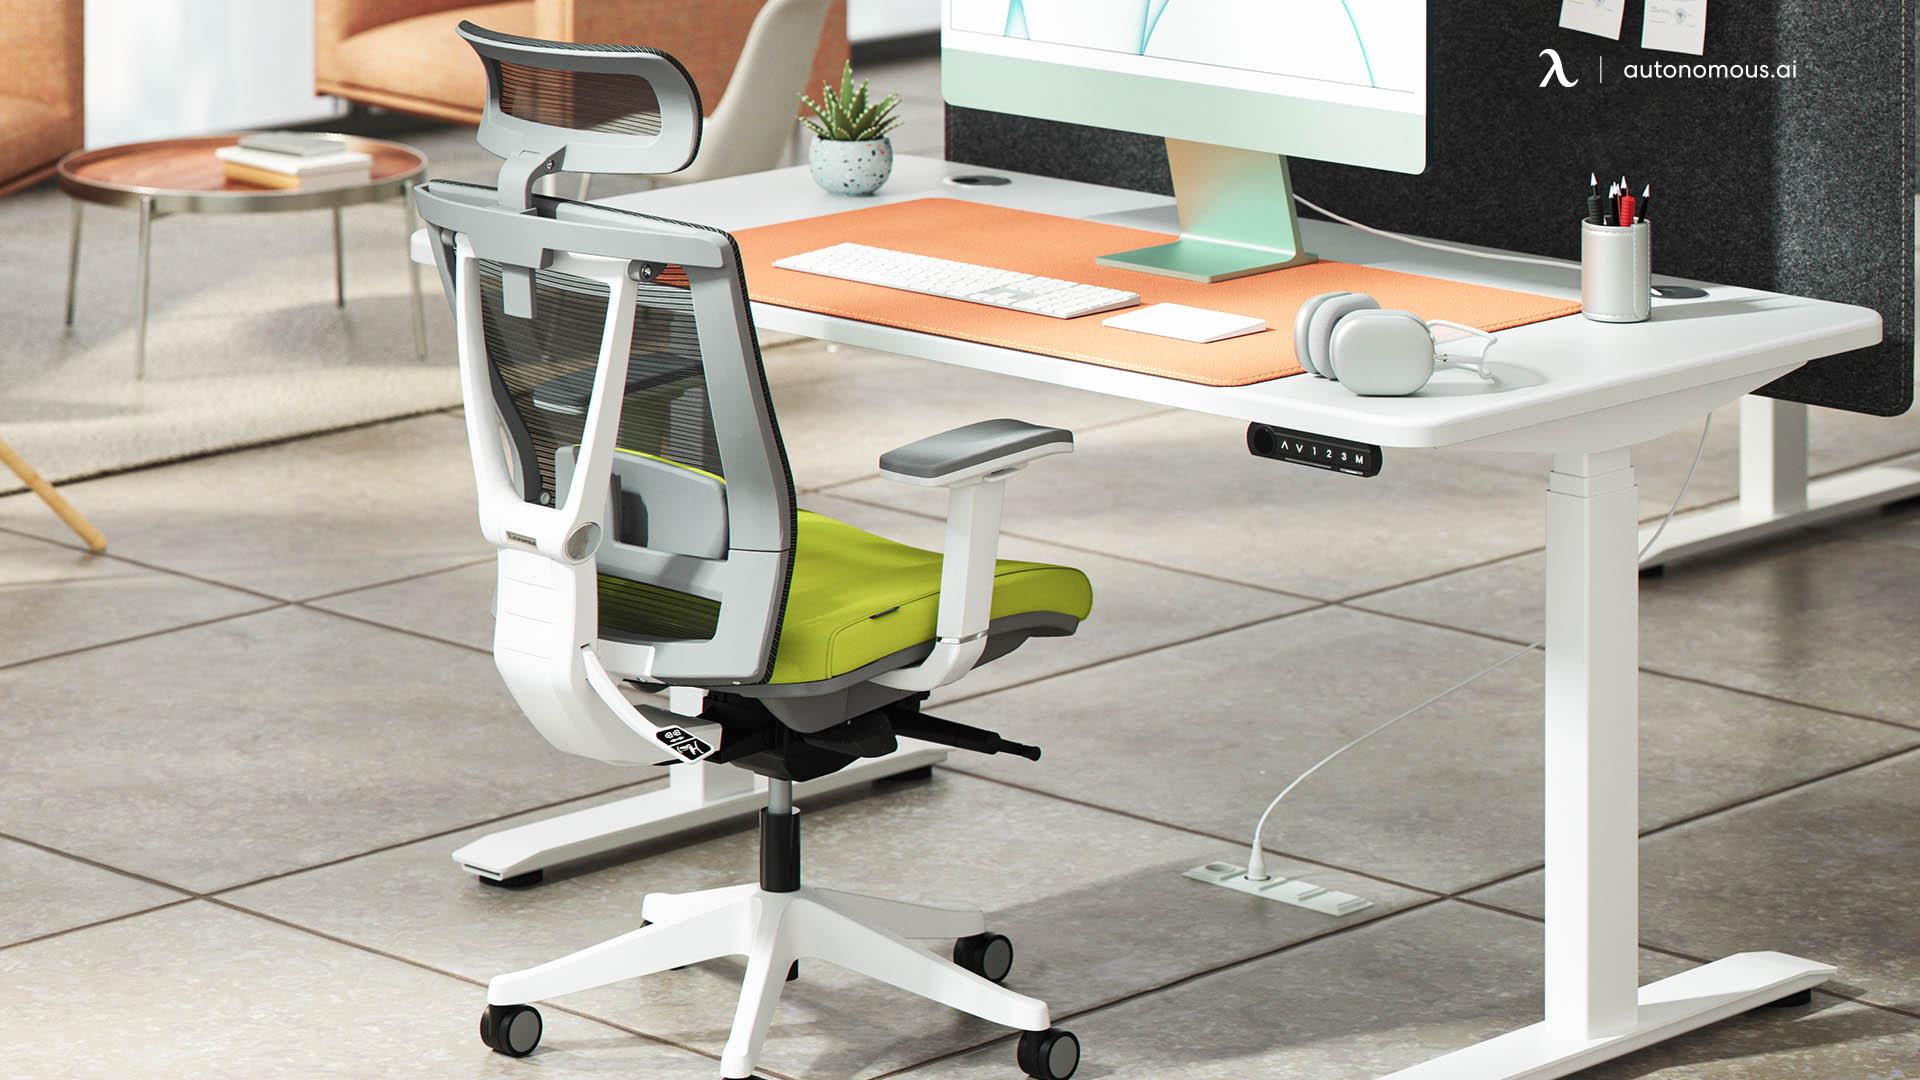 Adjustable Height Ergonomic Chairs